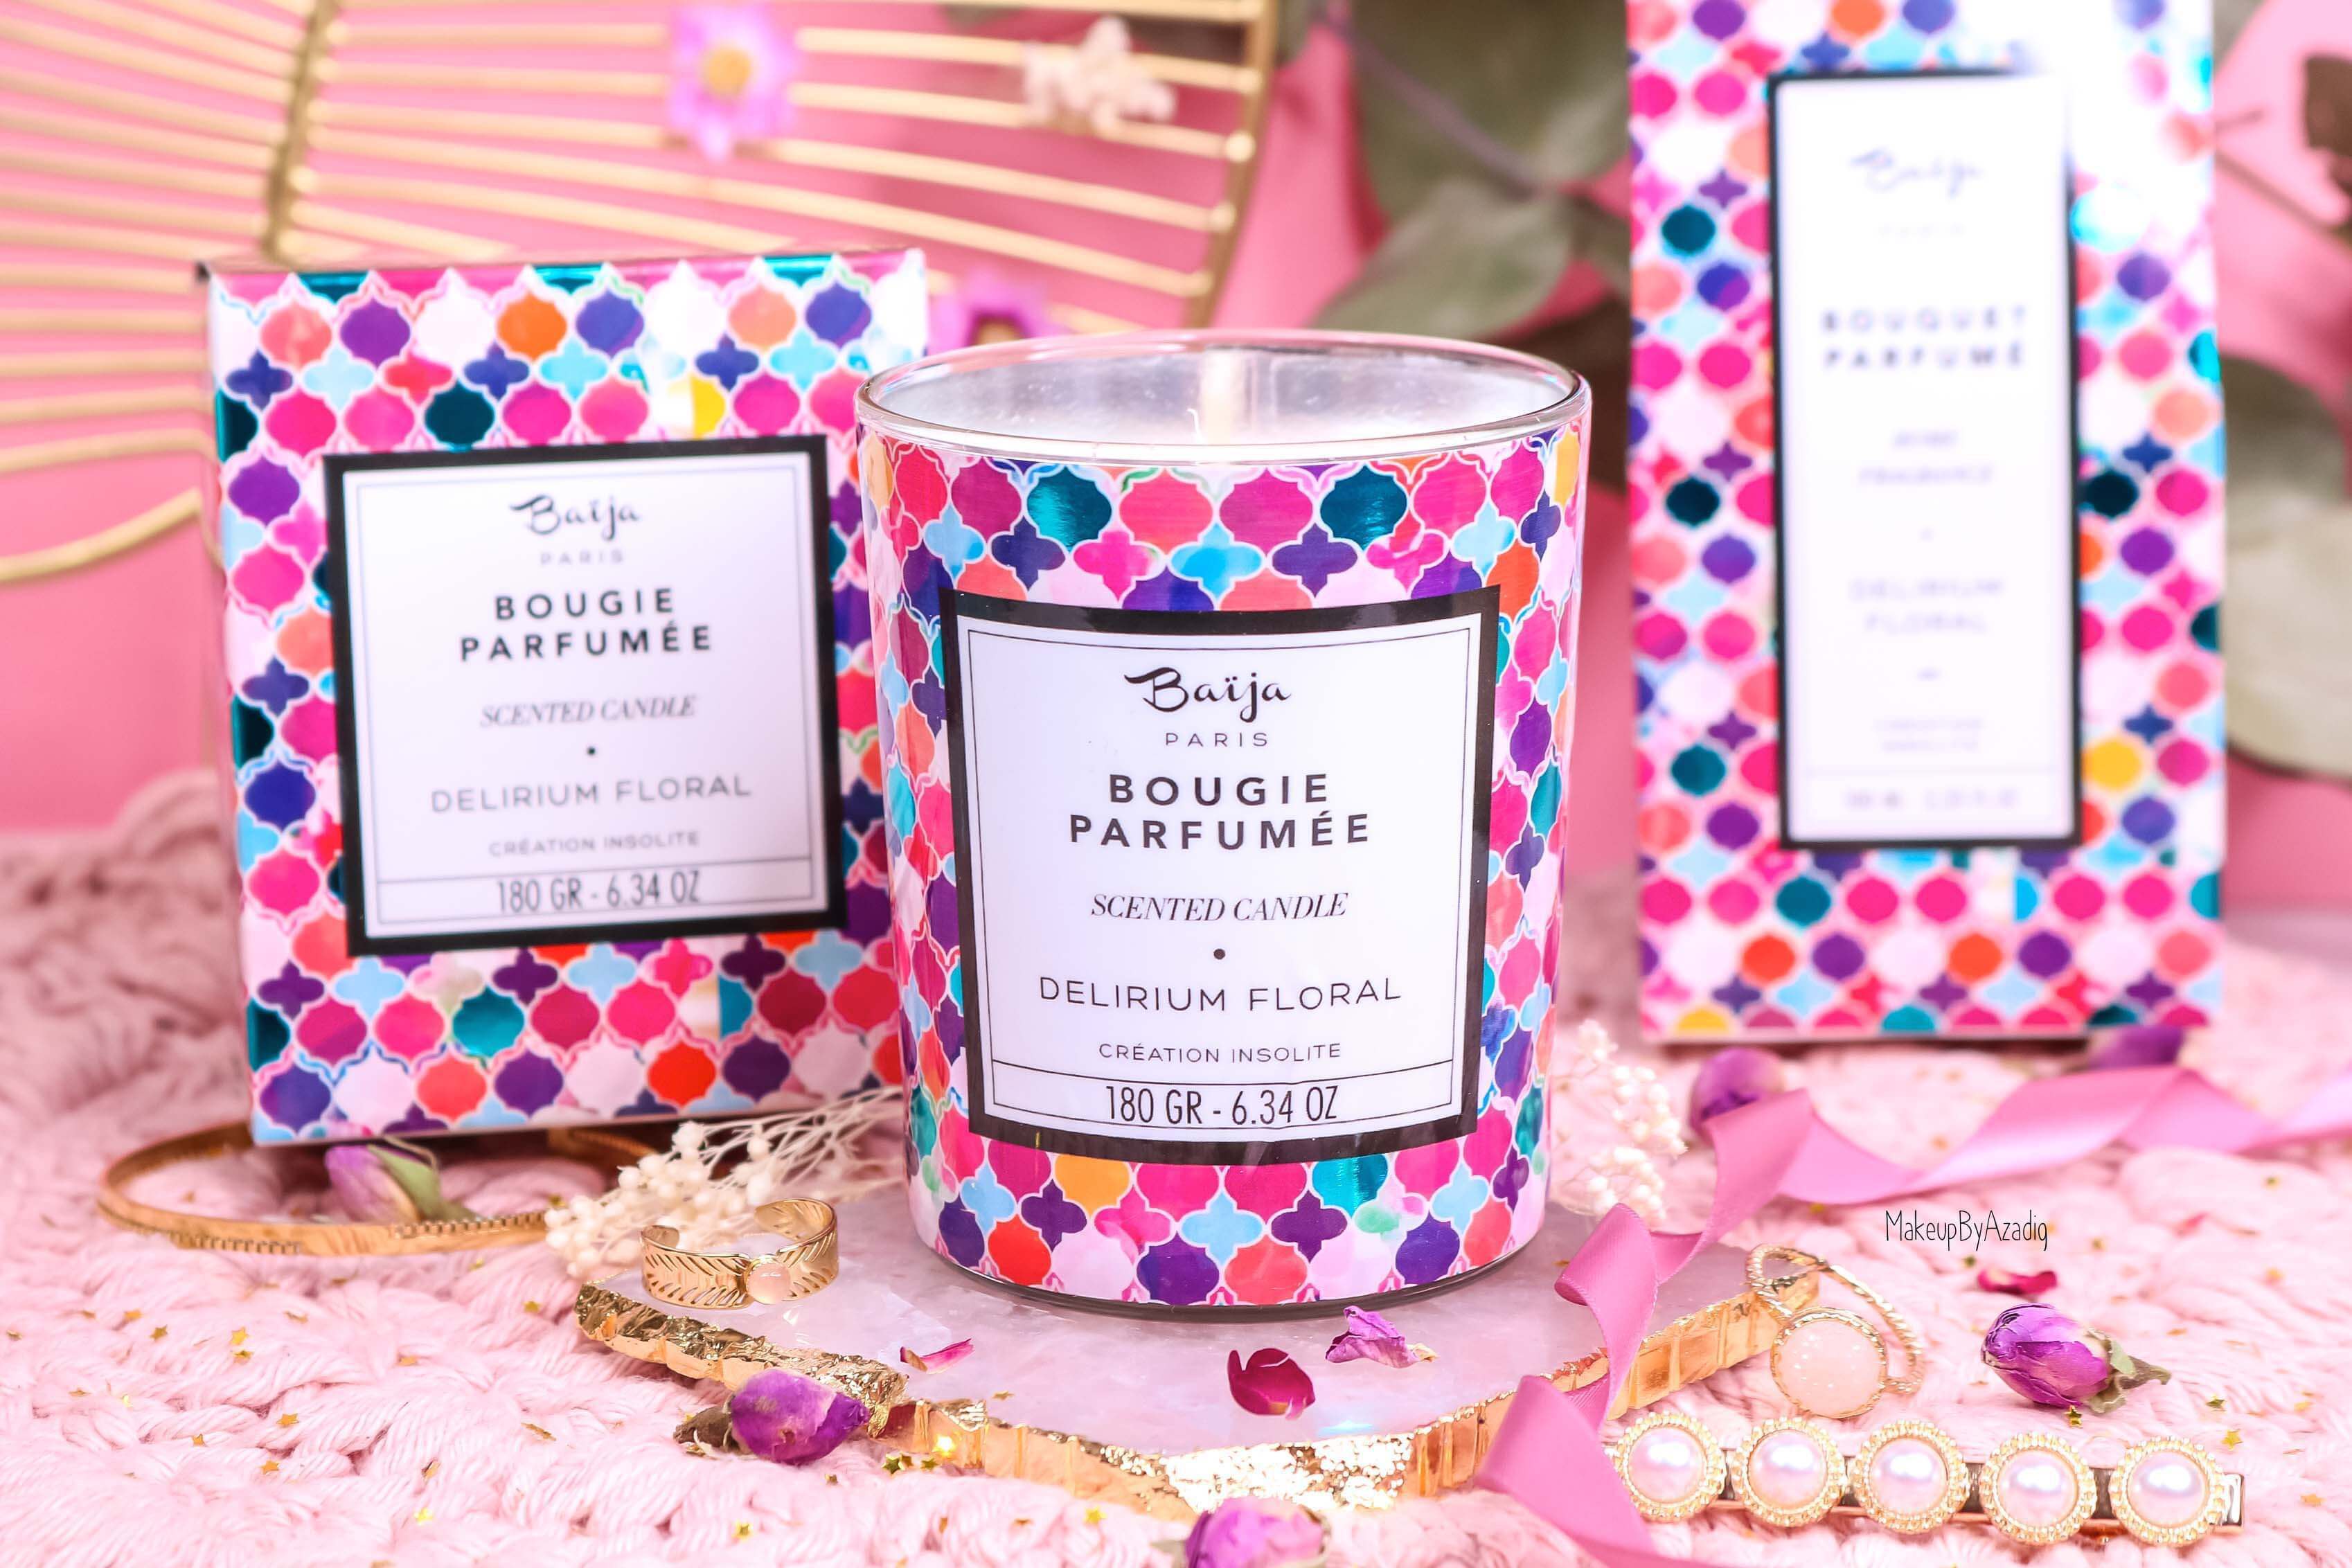 revue-collection-delirium-floral-baija-paris-corps-bougie-gommage-soin-fleurs-makeupbyazadig-avis-prix-sephora-candle